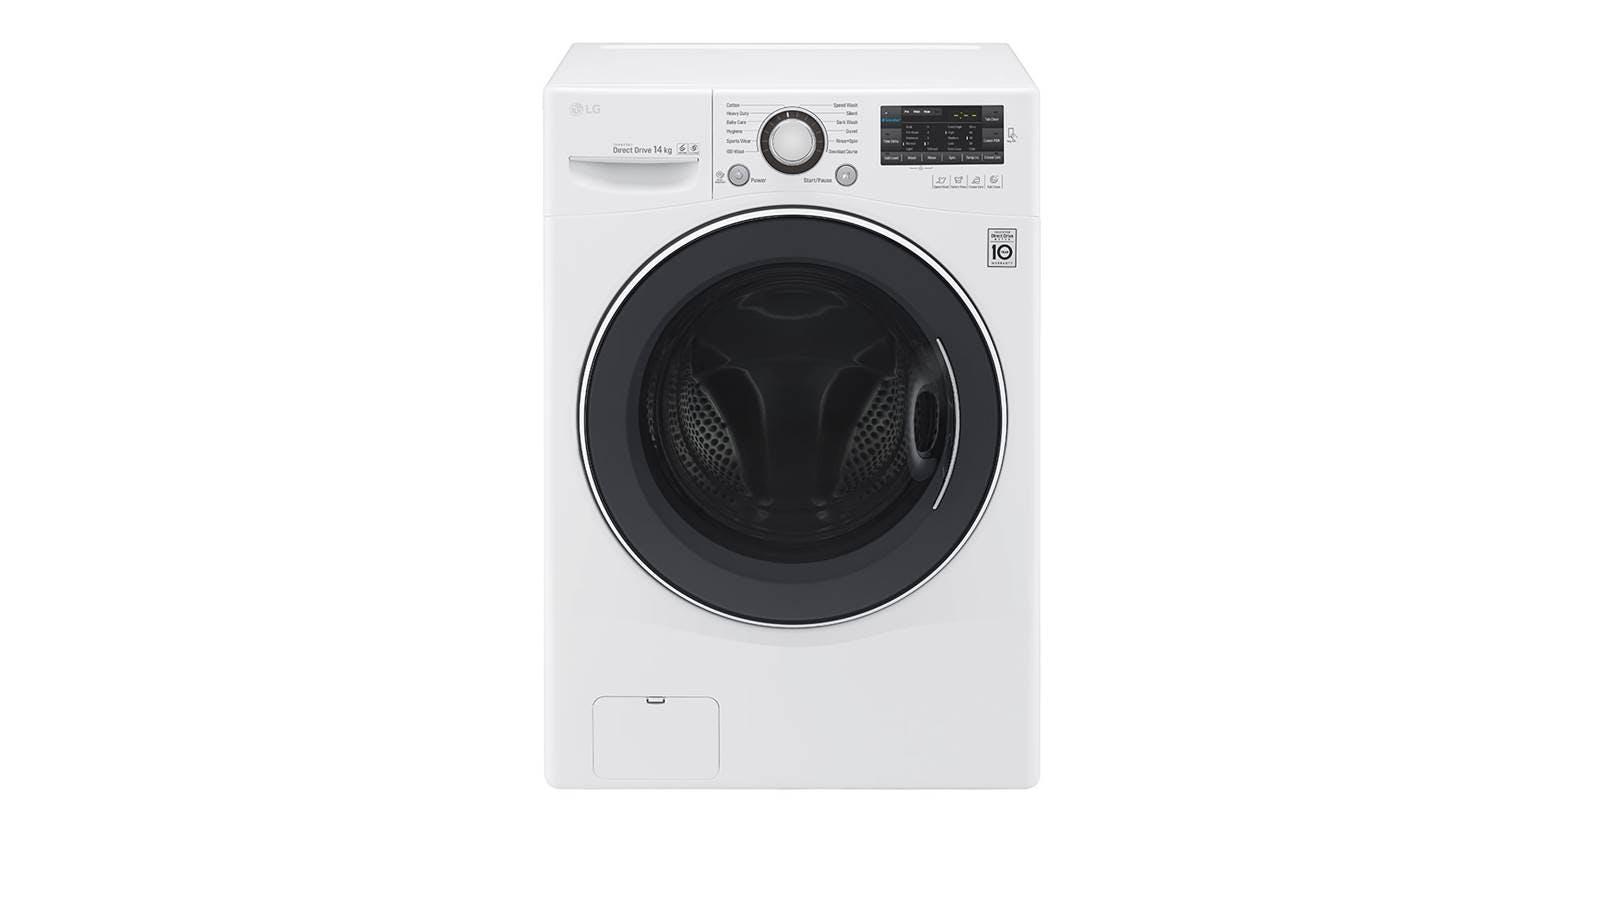 Lg f2514ntgw 14kg front load washer harvey norman malaysia lg f2514ntgw 14kg front load washer buycottarizona Images